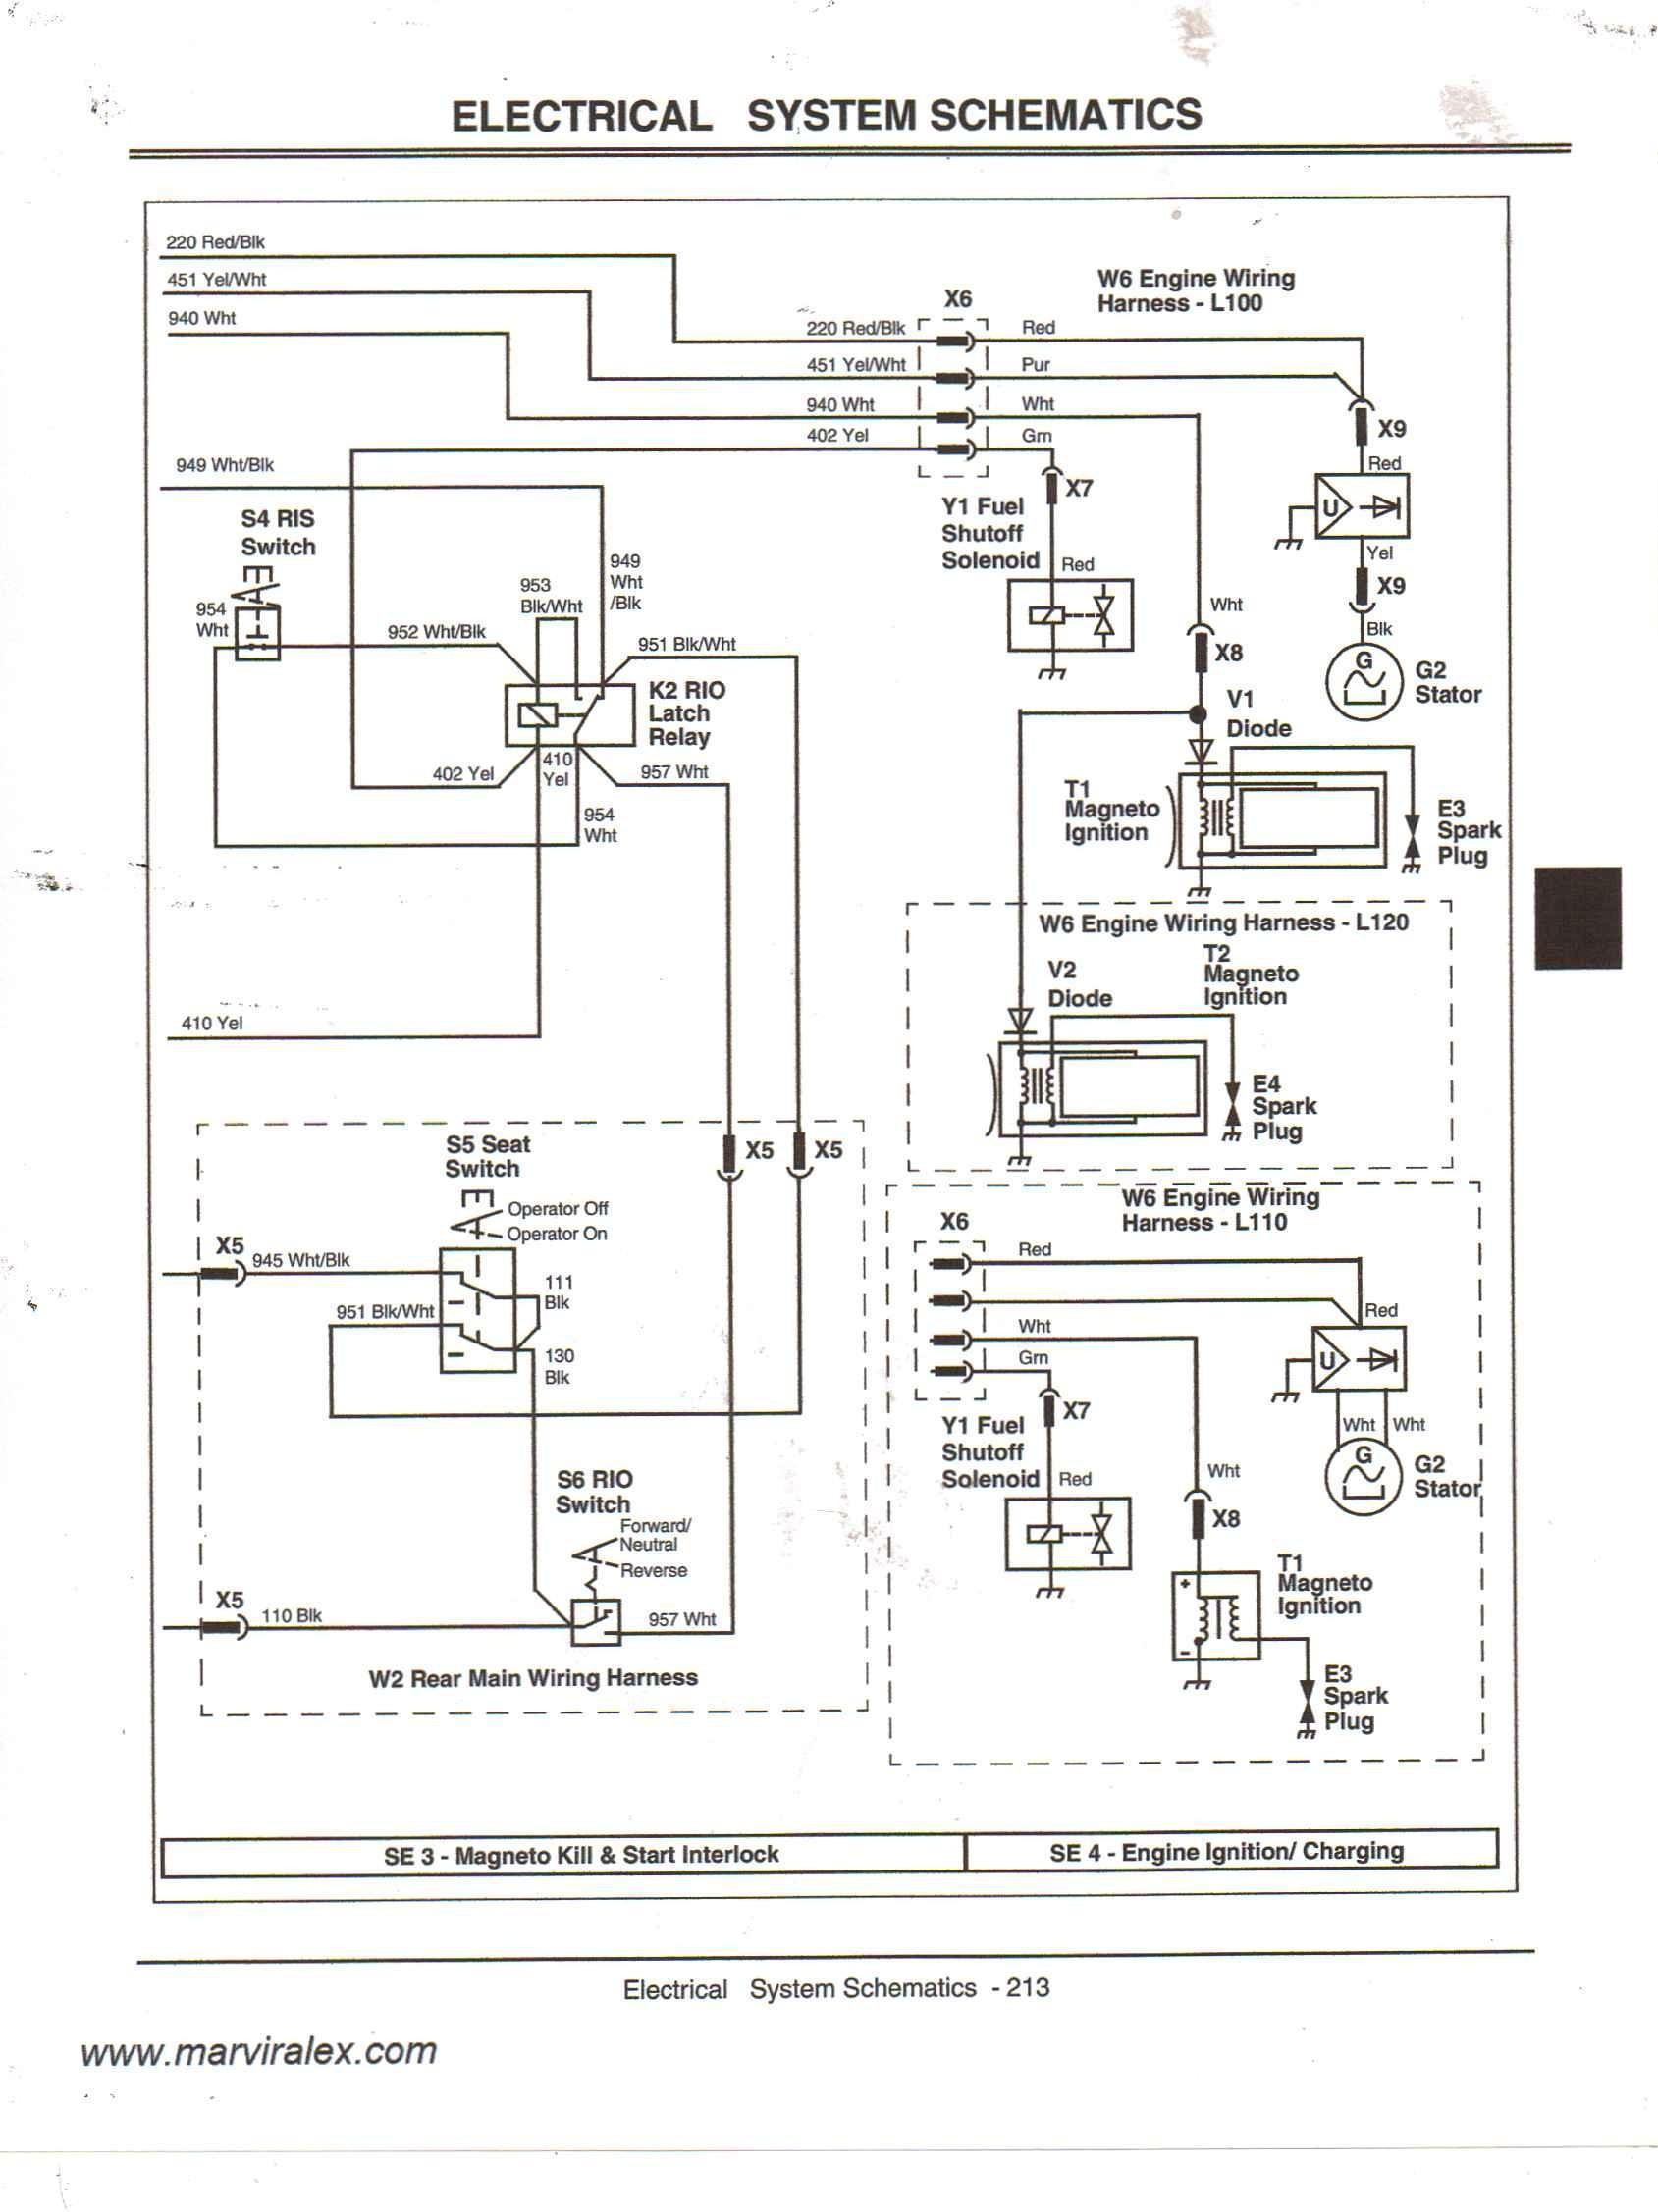 John Deere 160 Wiring Diagram - 11.20.matthiasmwolf.de •